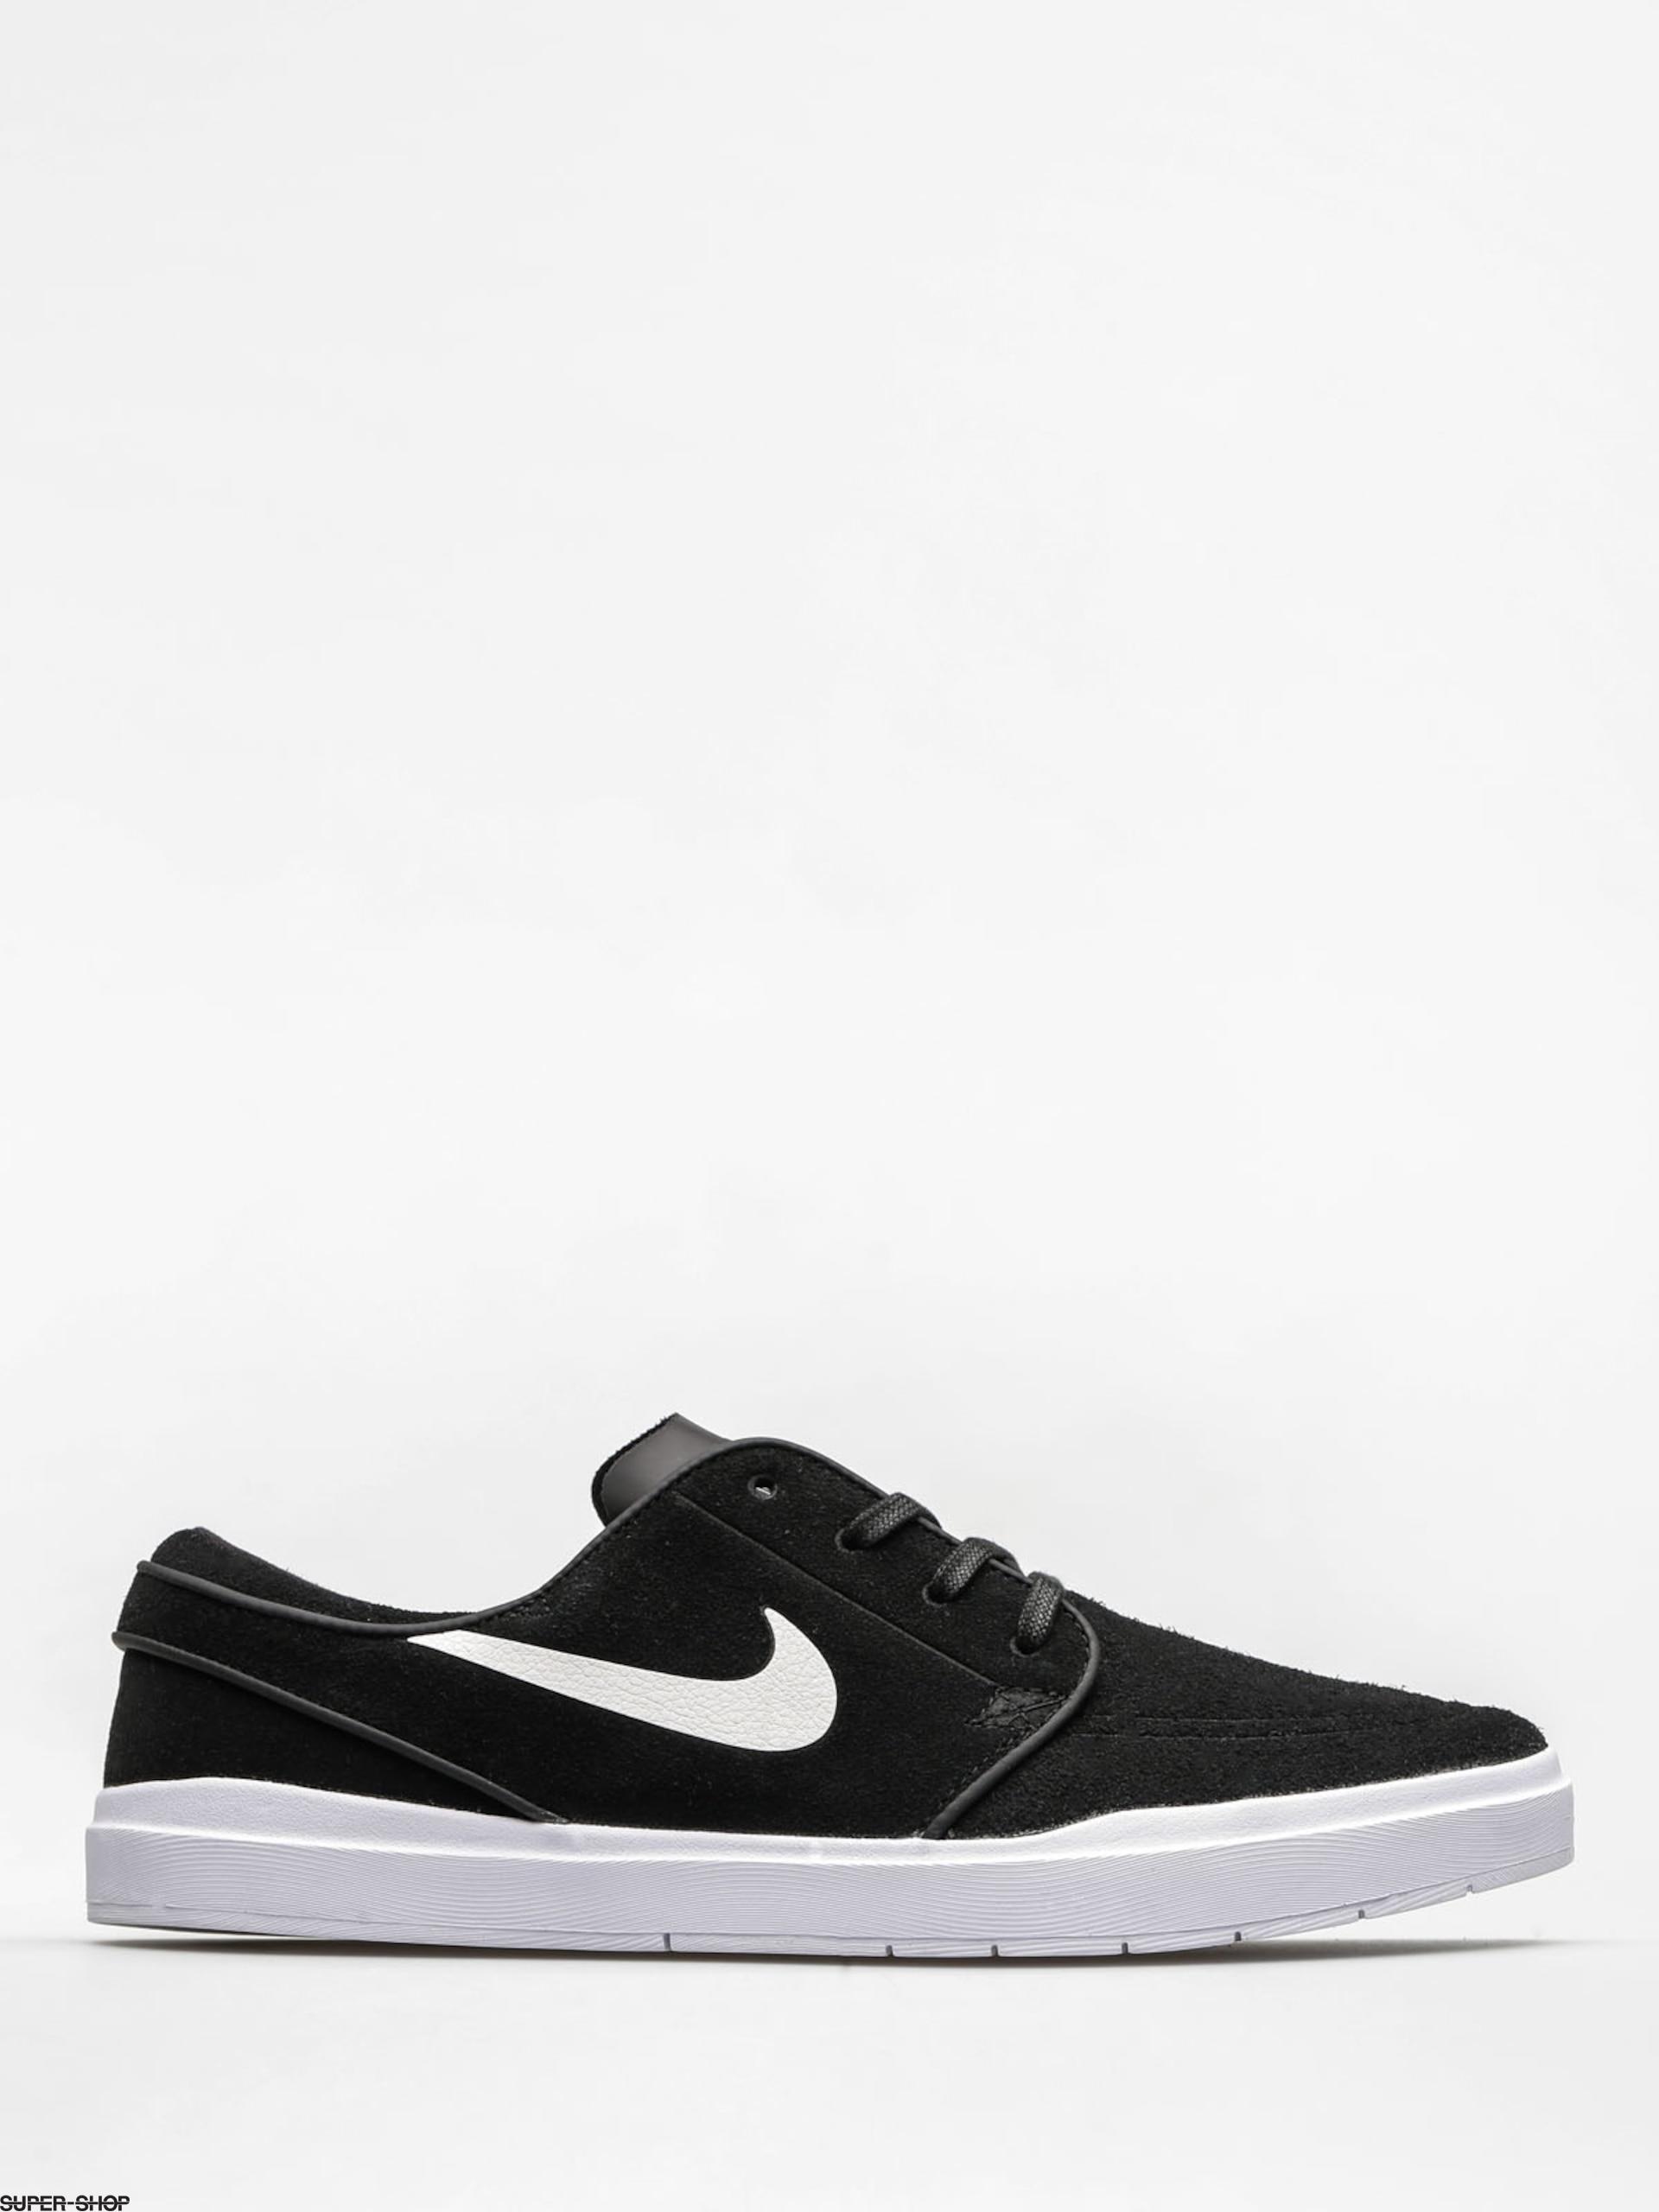 grandioso violento voltaje  Nike SB Shoes Stefan Janoski Hyperfeel (black/white)